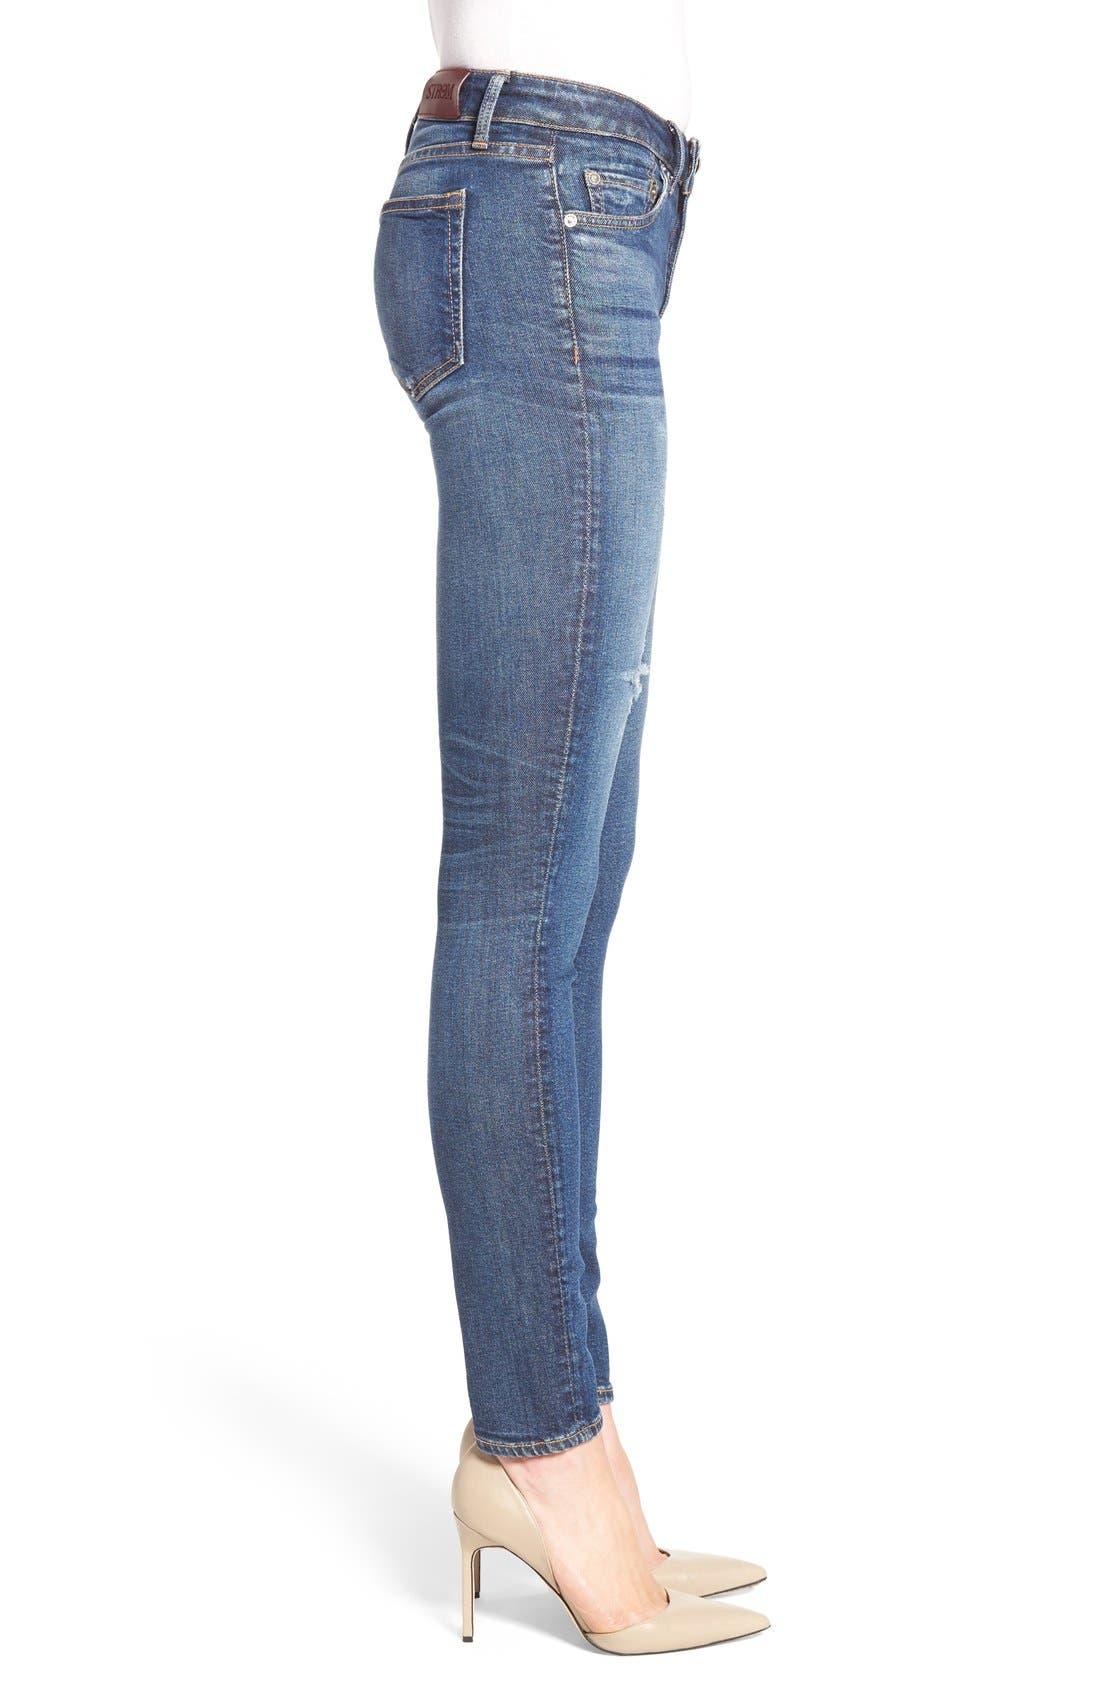 STROM,                             'Tio' Ankle Skinny Jeans,                             Alternate thumbnail 3, color,                             420